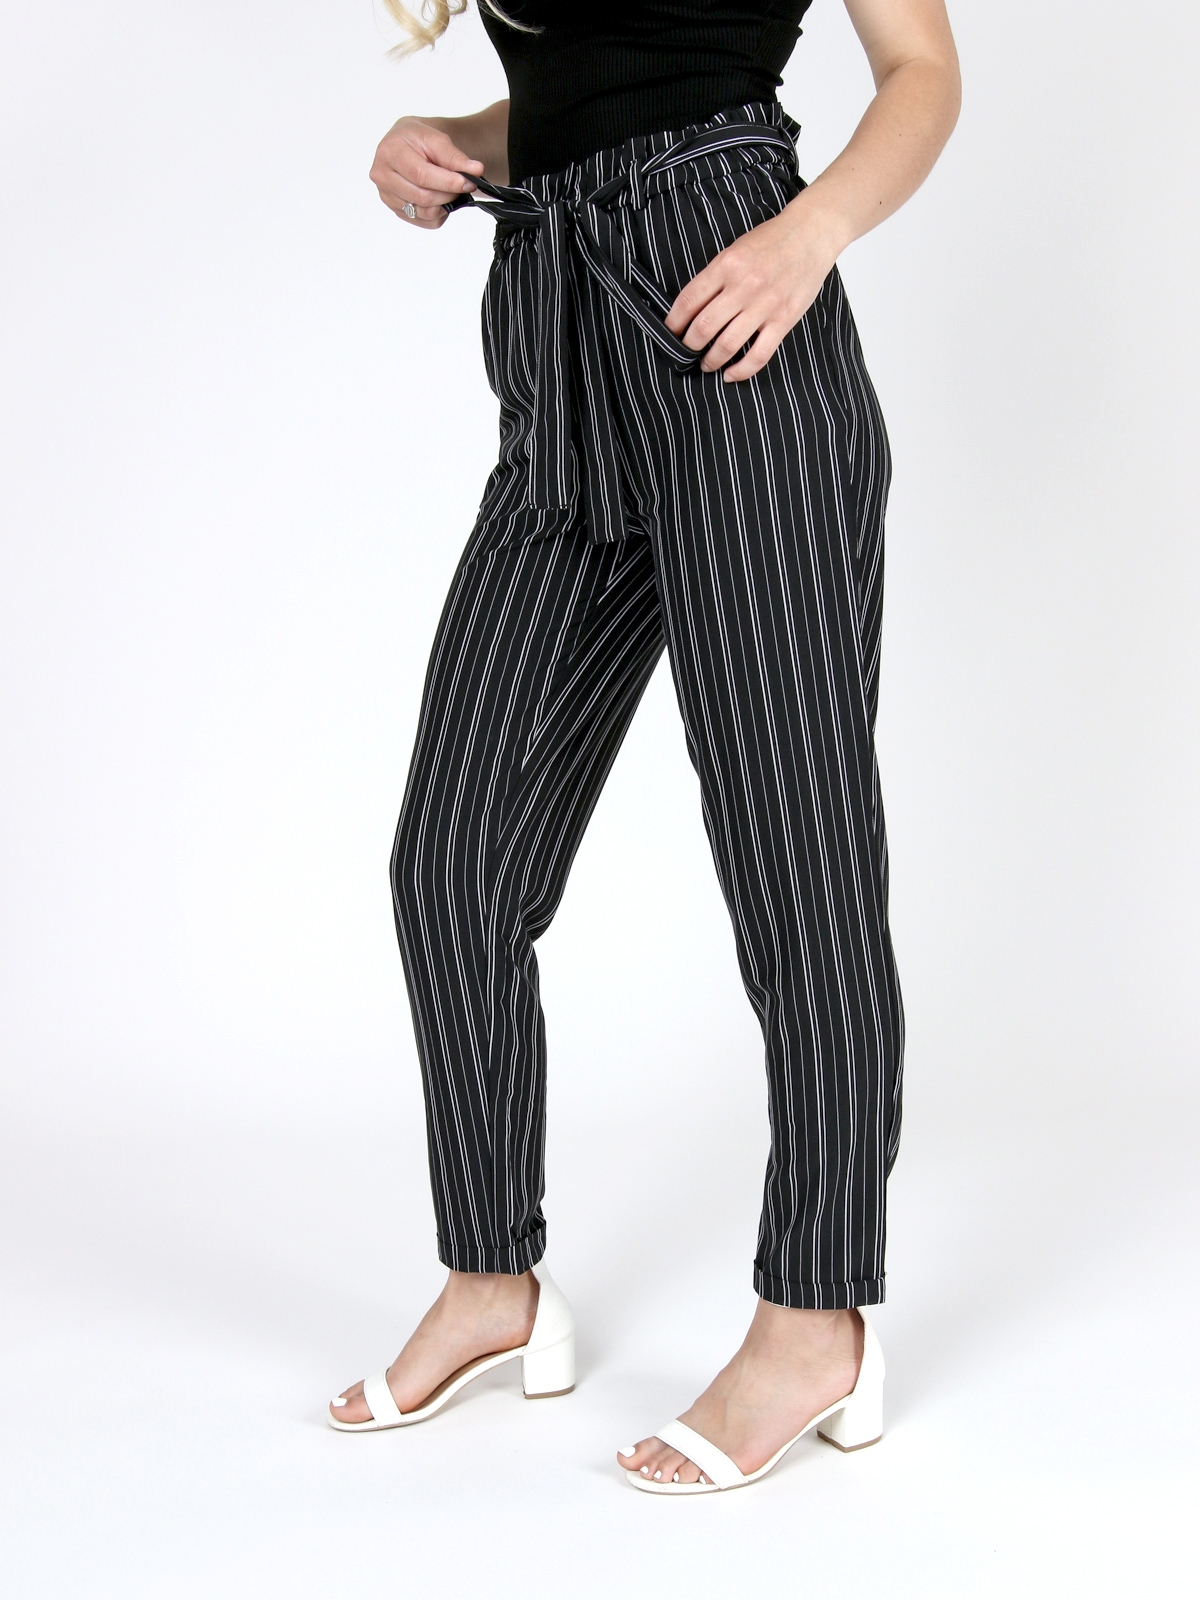 Deanna Pinstripe Tie Pant